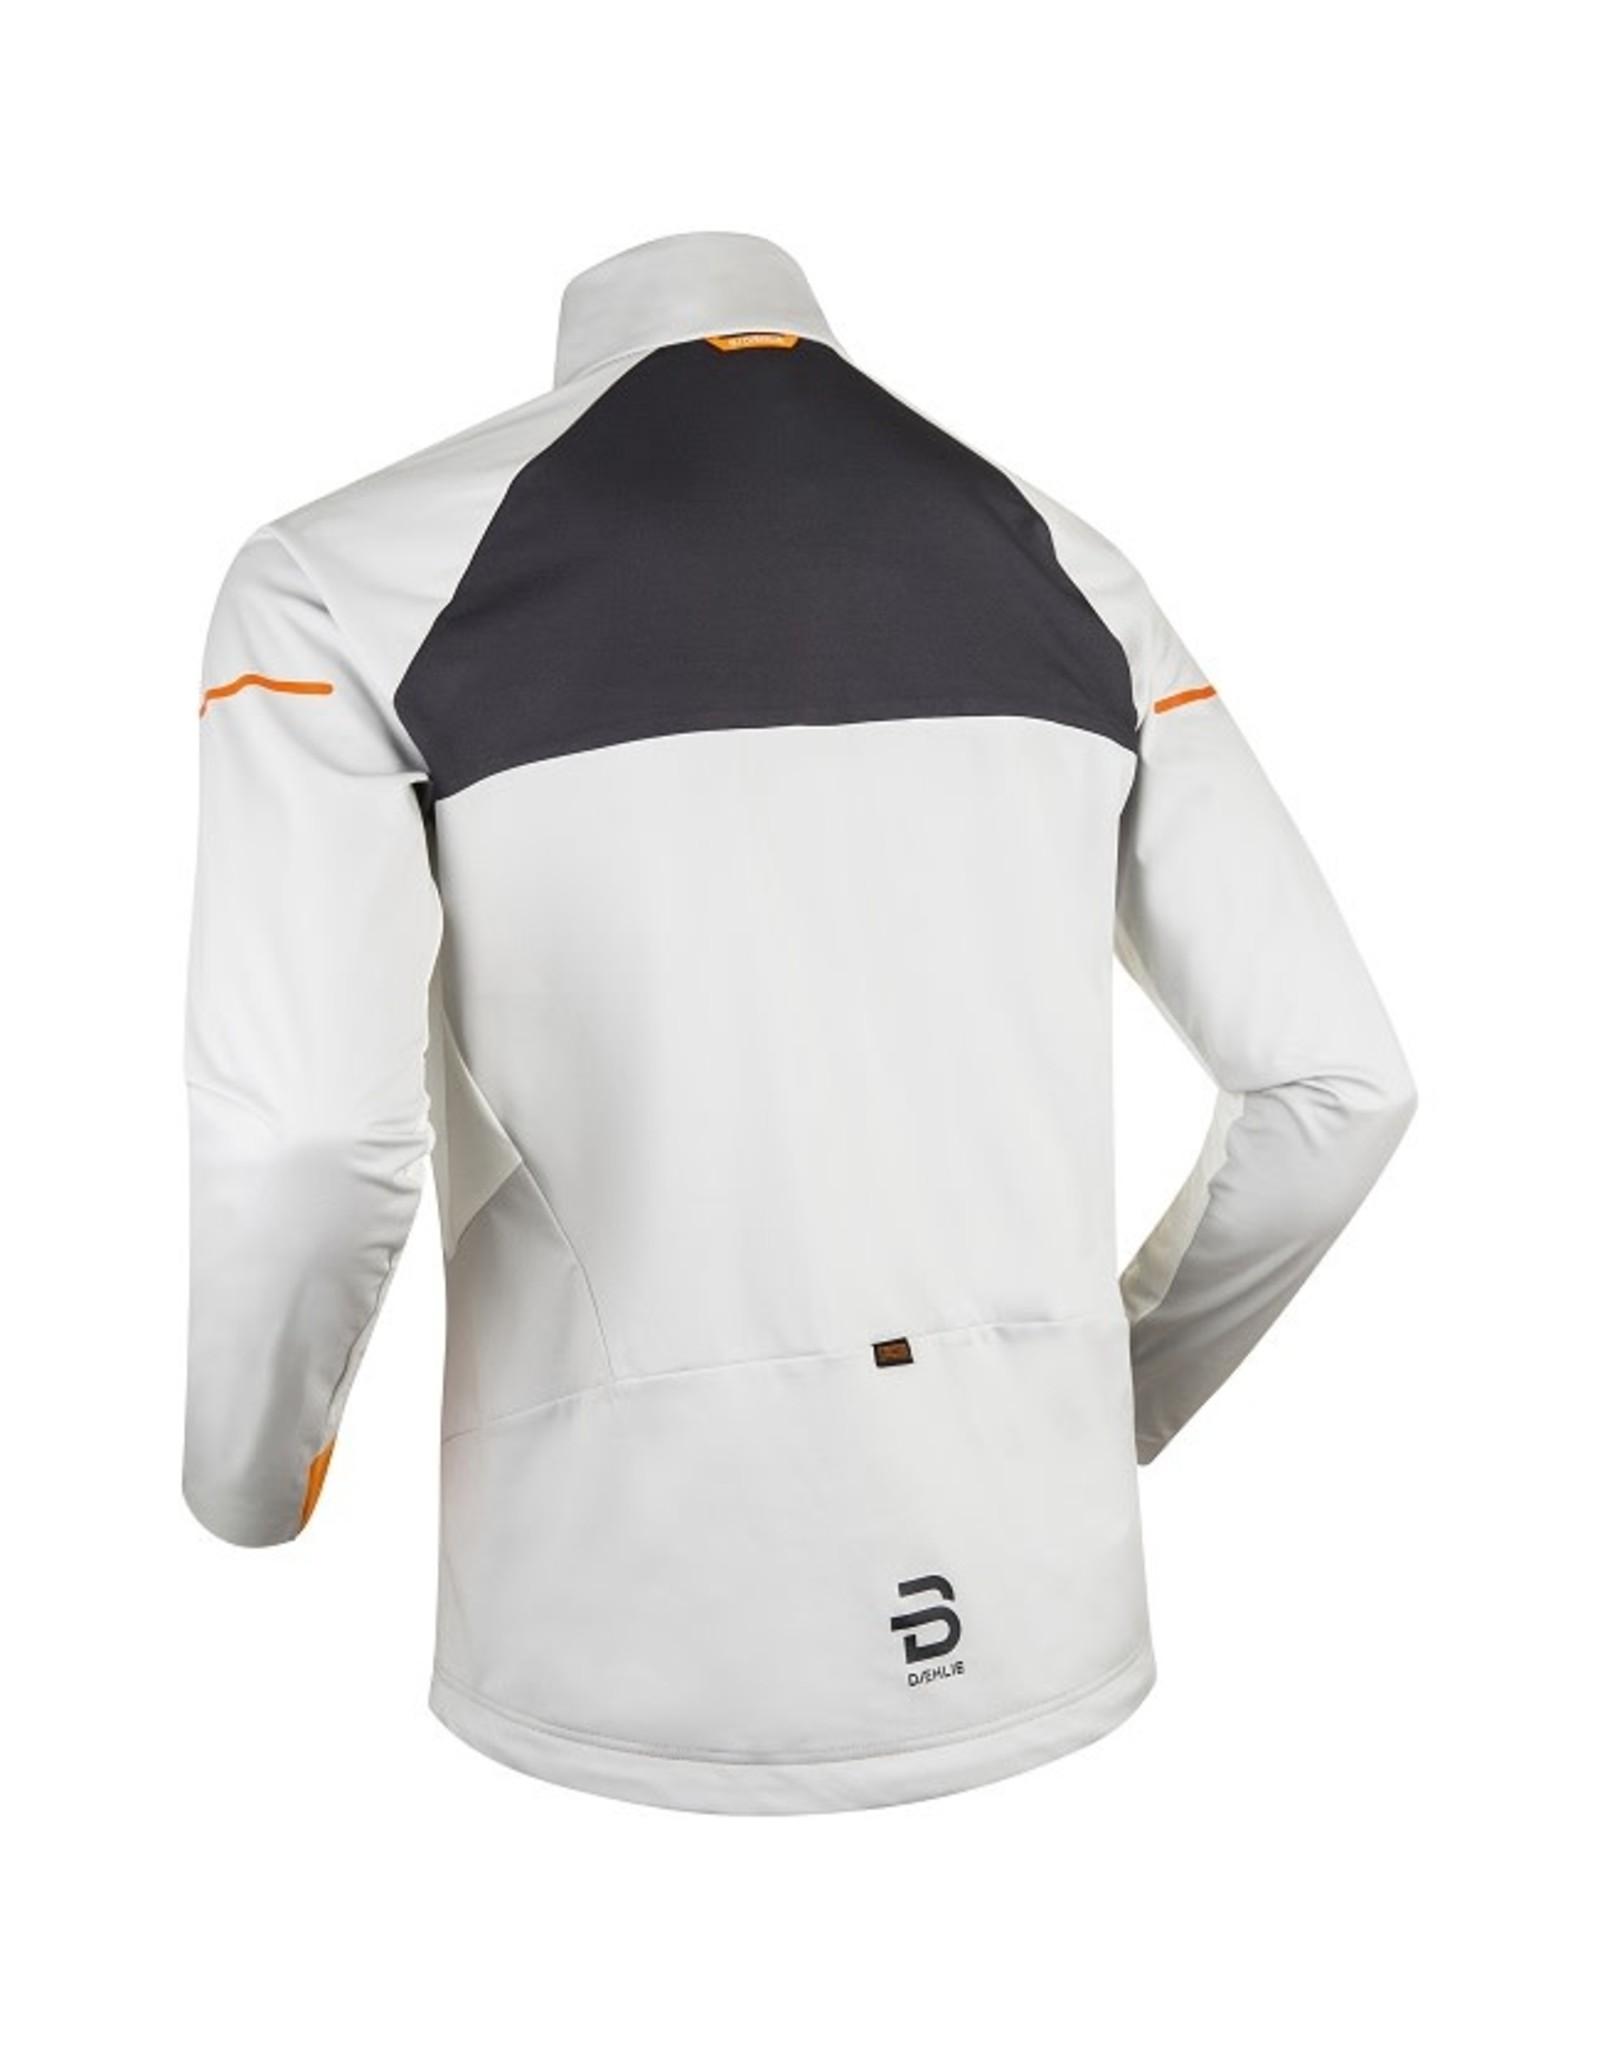 Bjorn Daehlie Bjorn Daehlie Jacket Challenge Men's